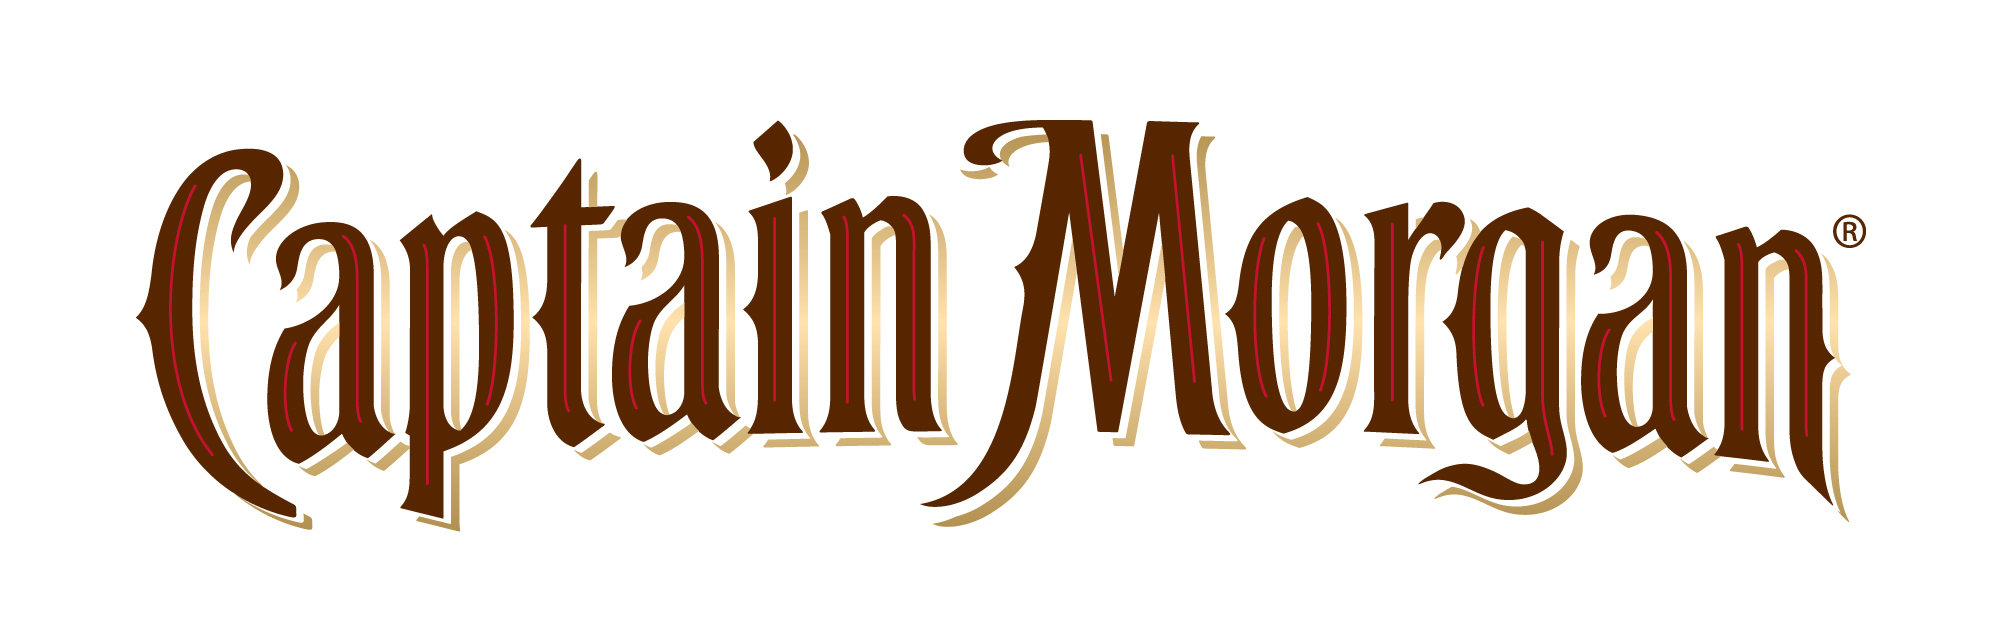 Captain Morgan1.jpeg